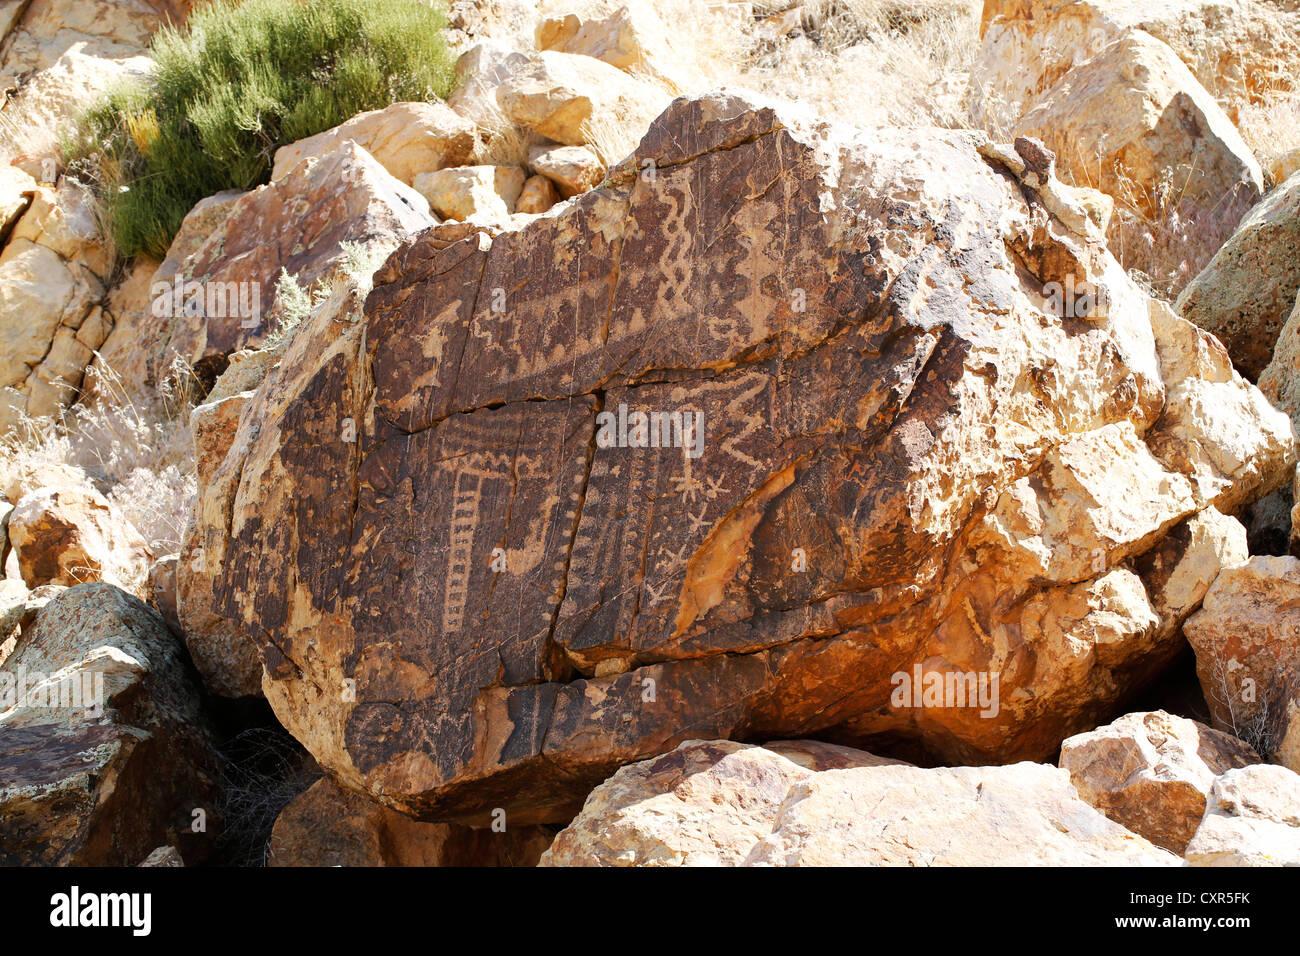 Parowan Gap pétroglyphes, art rock, Utah, USA Banque D'Images